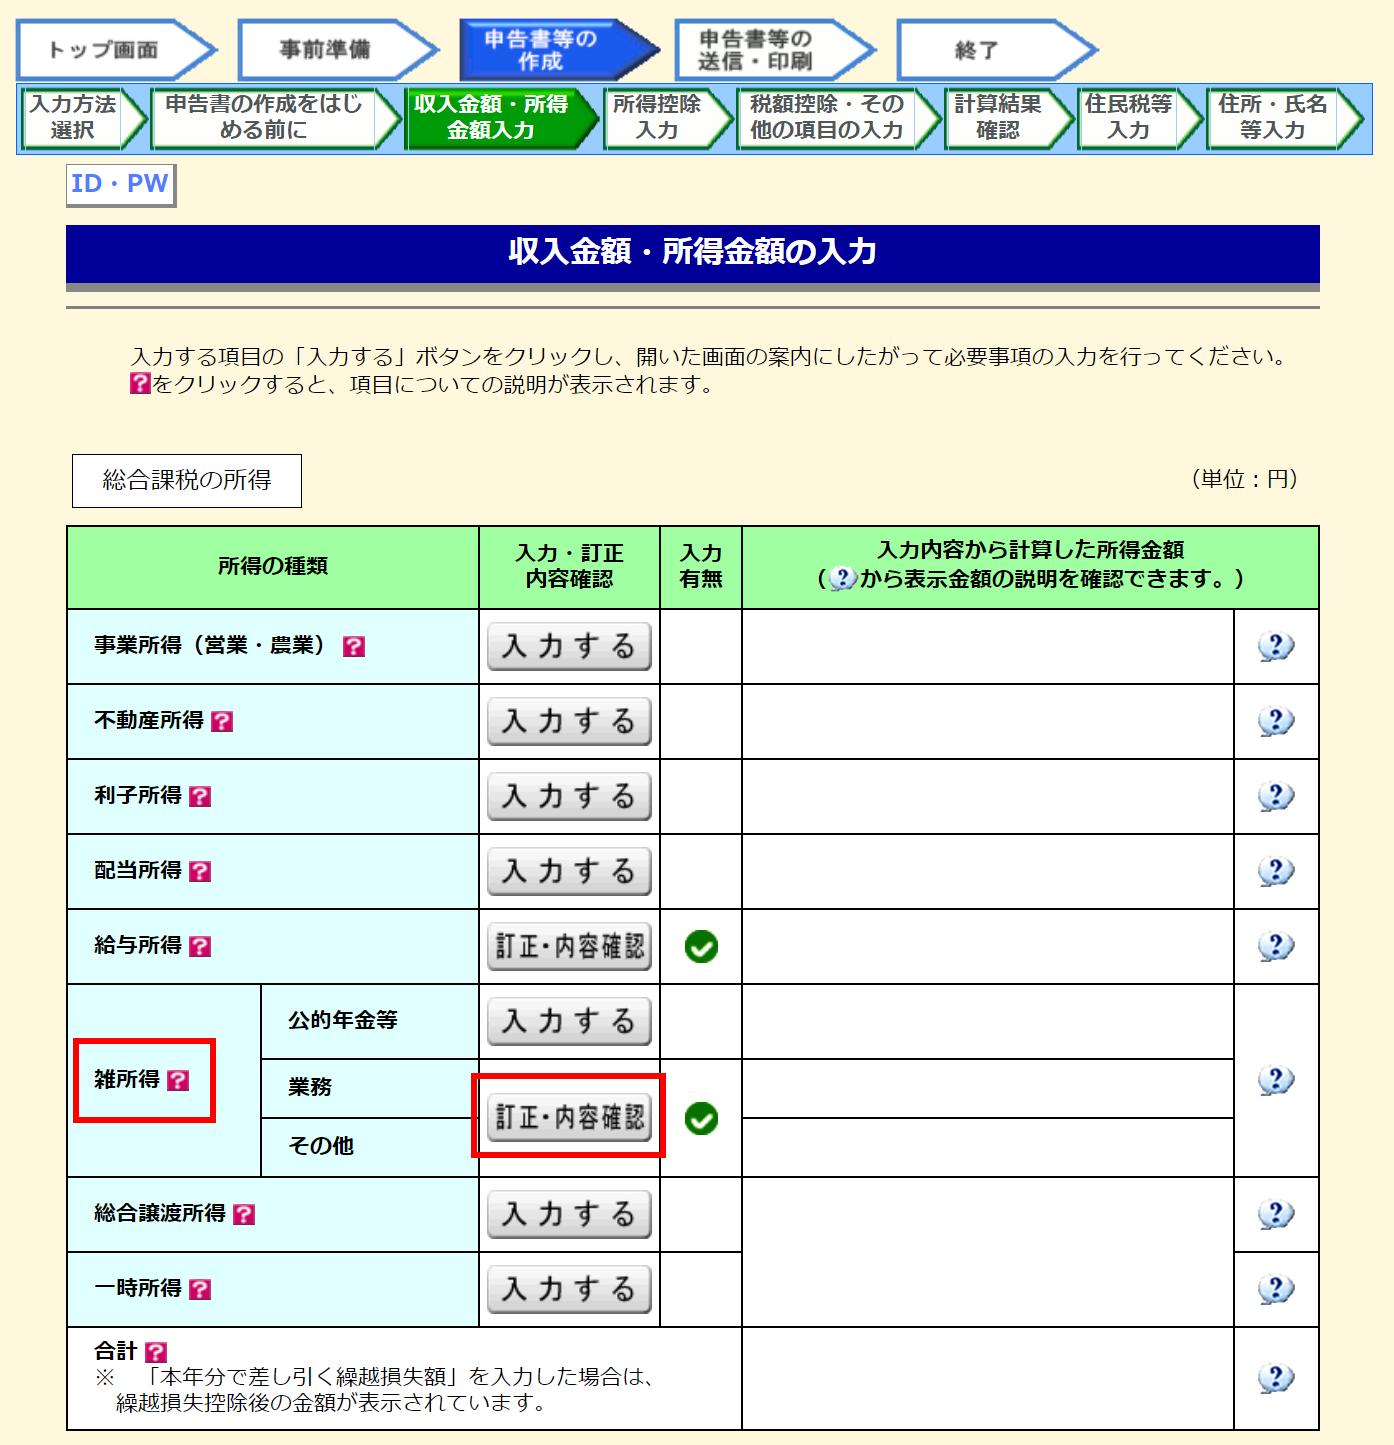 f:id:hodo-work:20210127204517p:plain